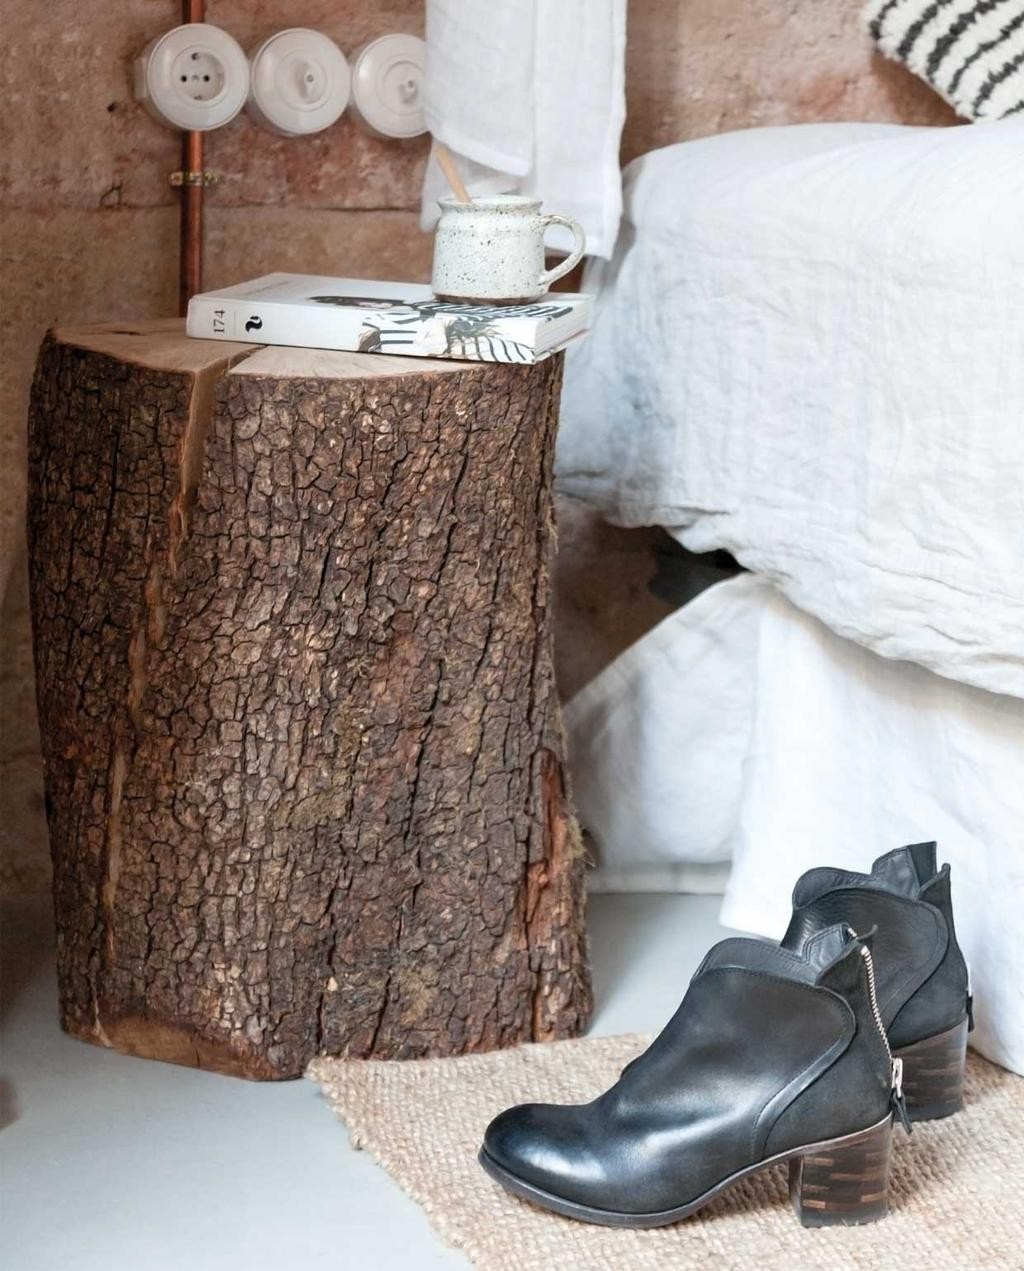 vtwonen 09 | Binnenkijker | boomstammen nachtkastje